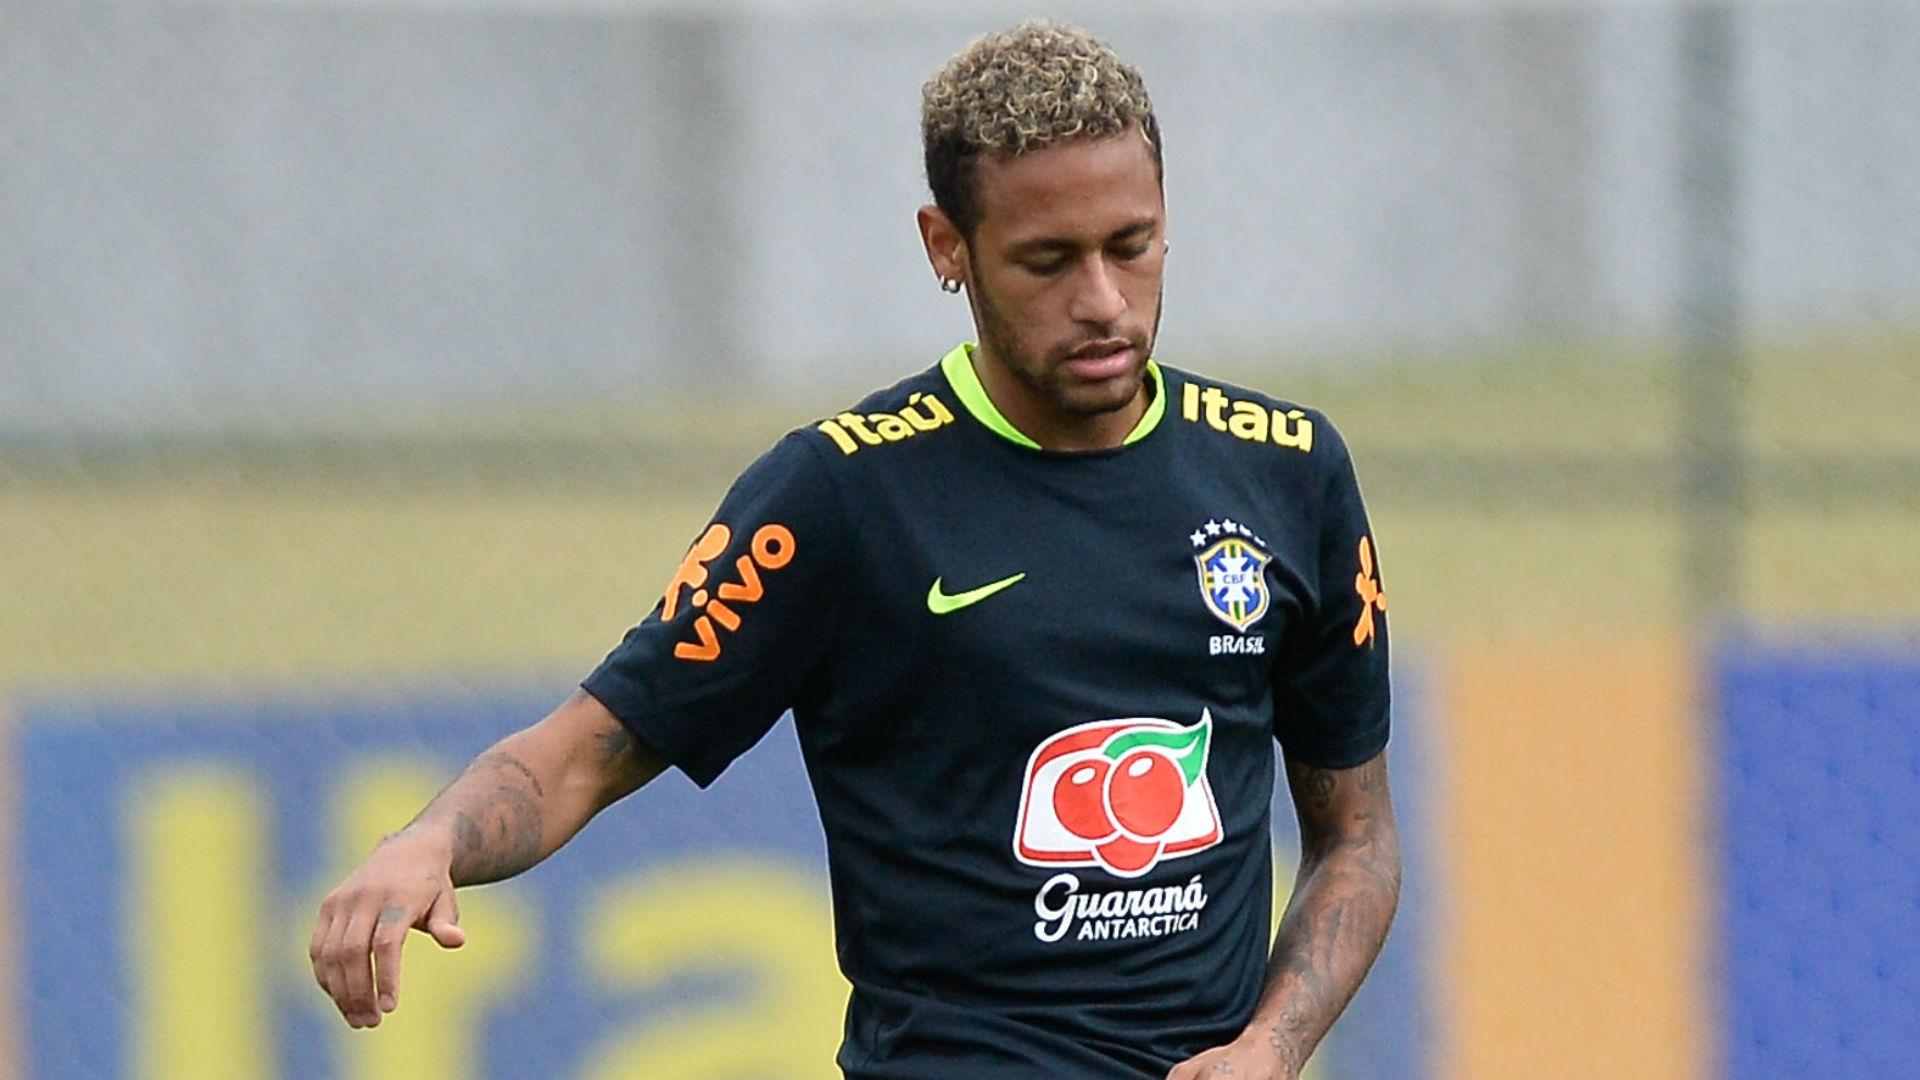 Neymar treino Seleção Brasil 03 10 2017